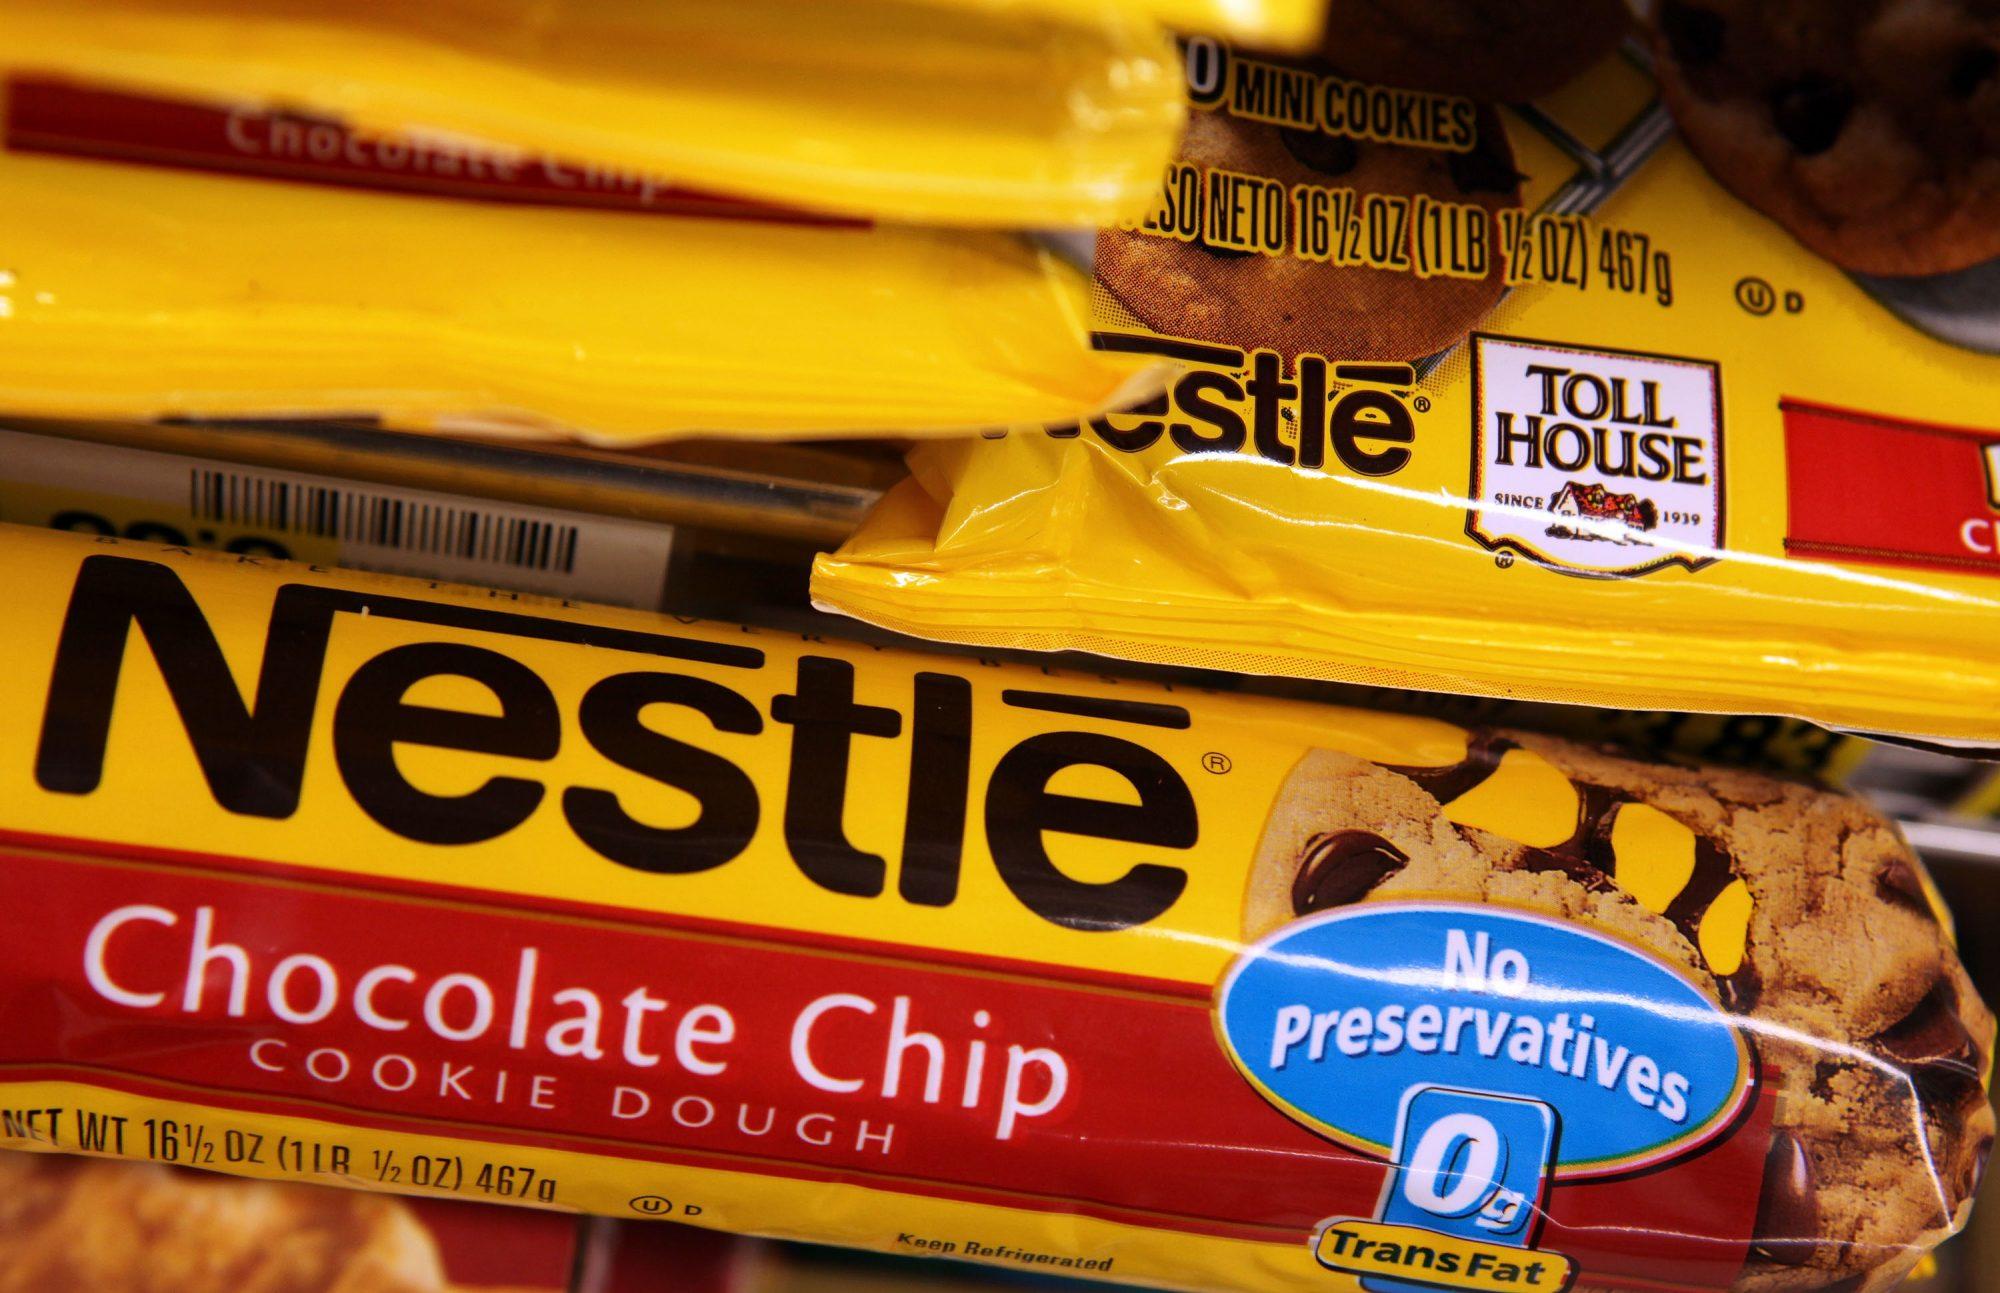 Nestle Getty 11/1/19